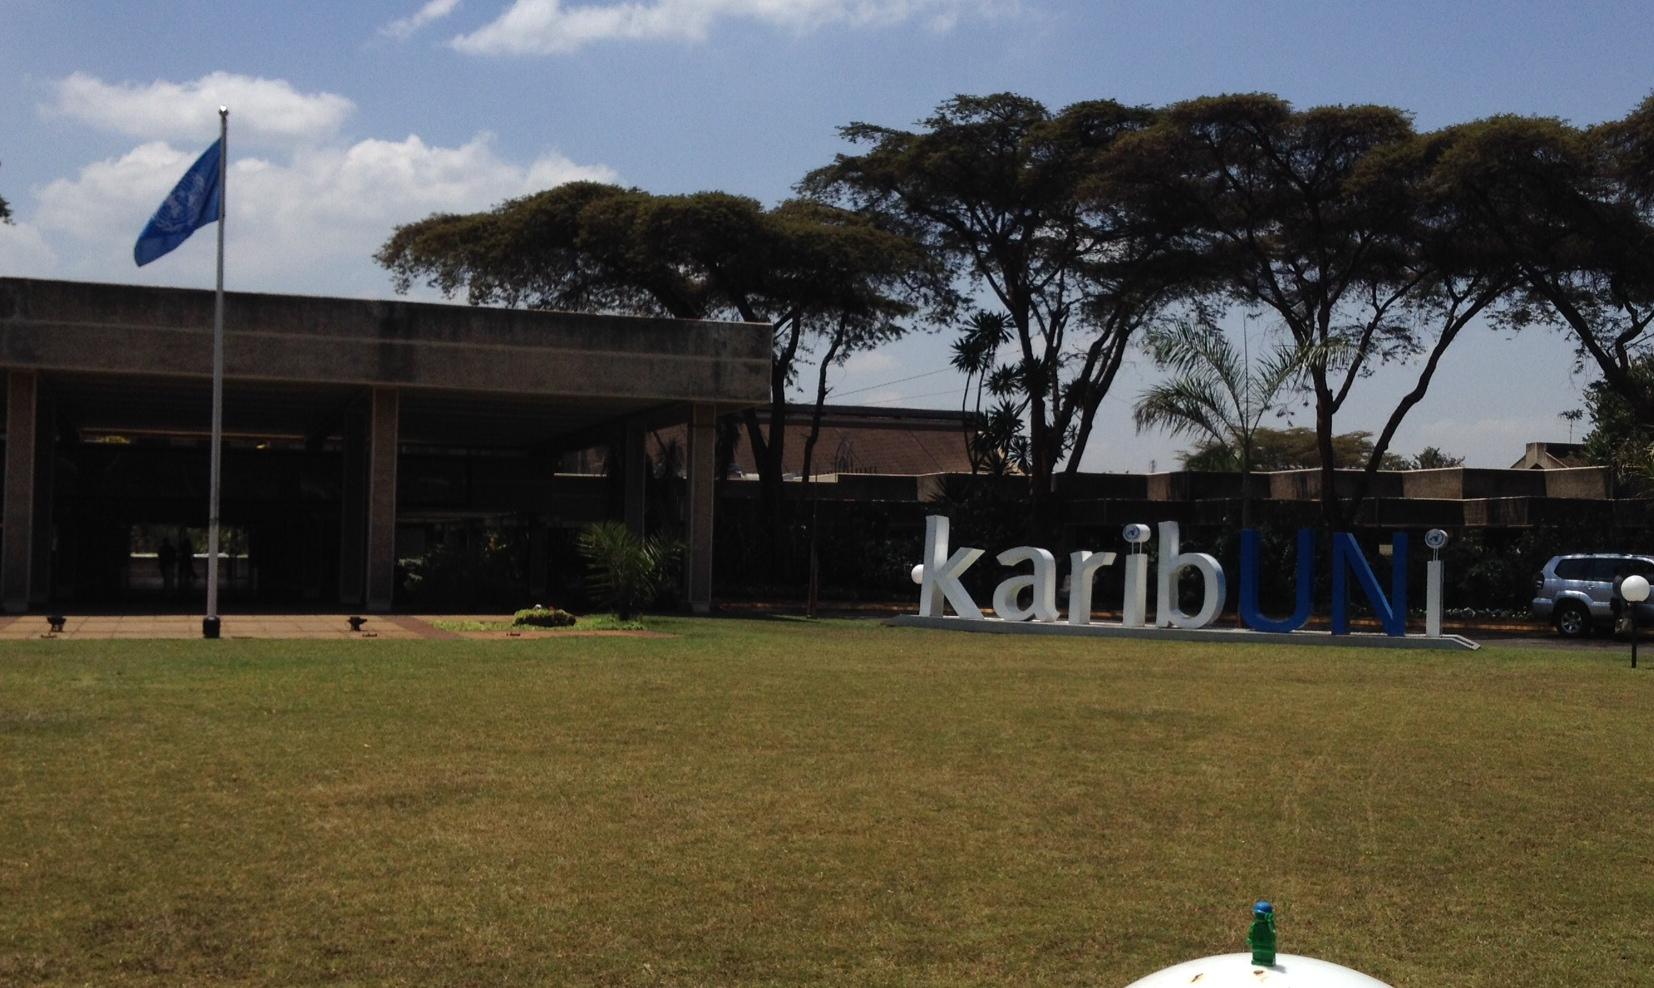 UN in Nairobi